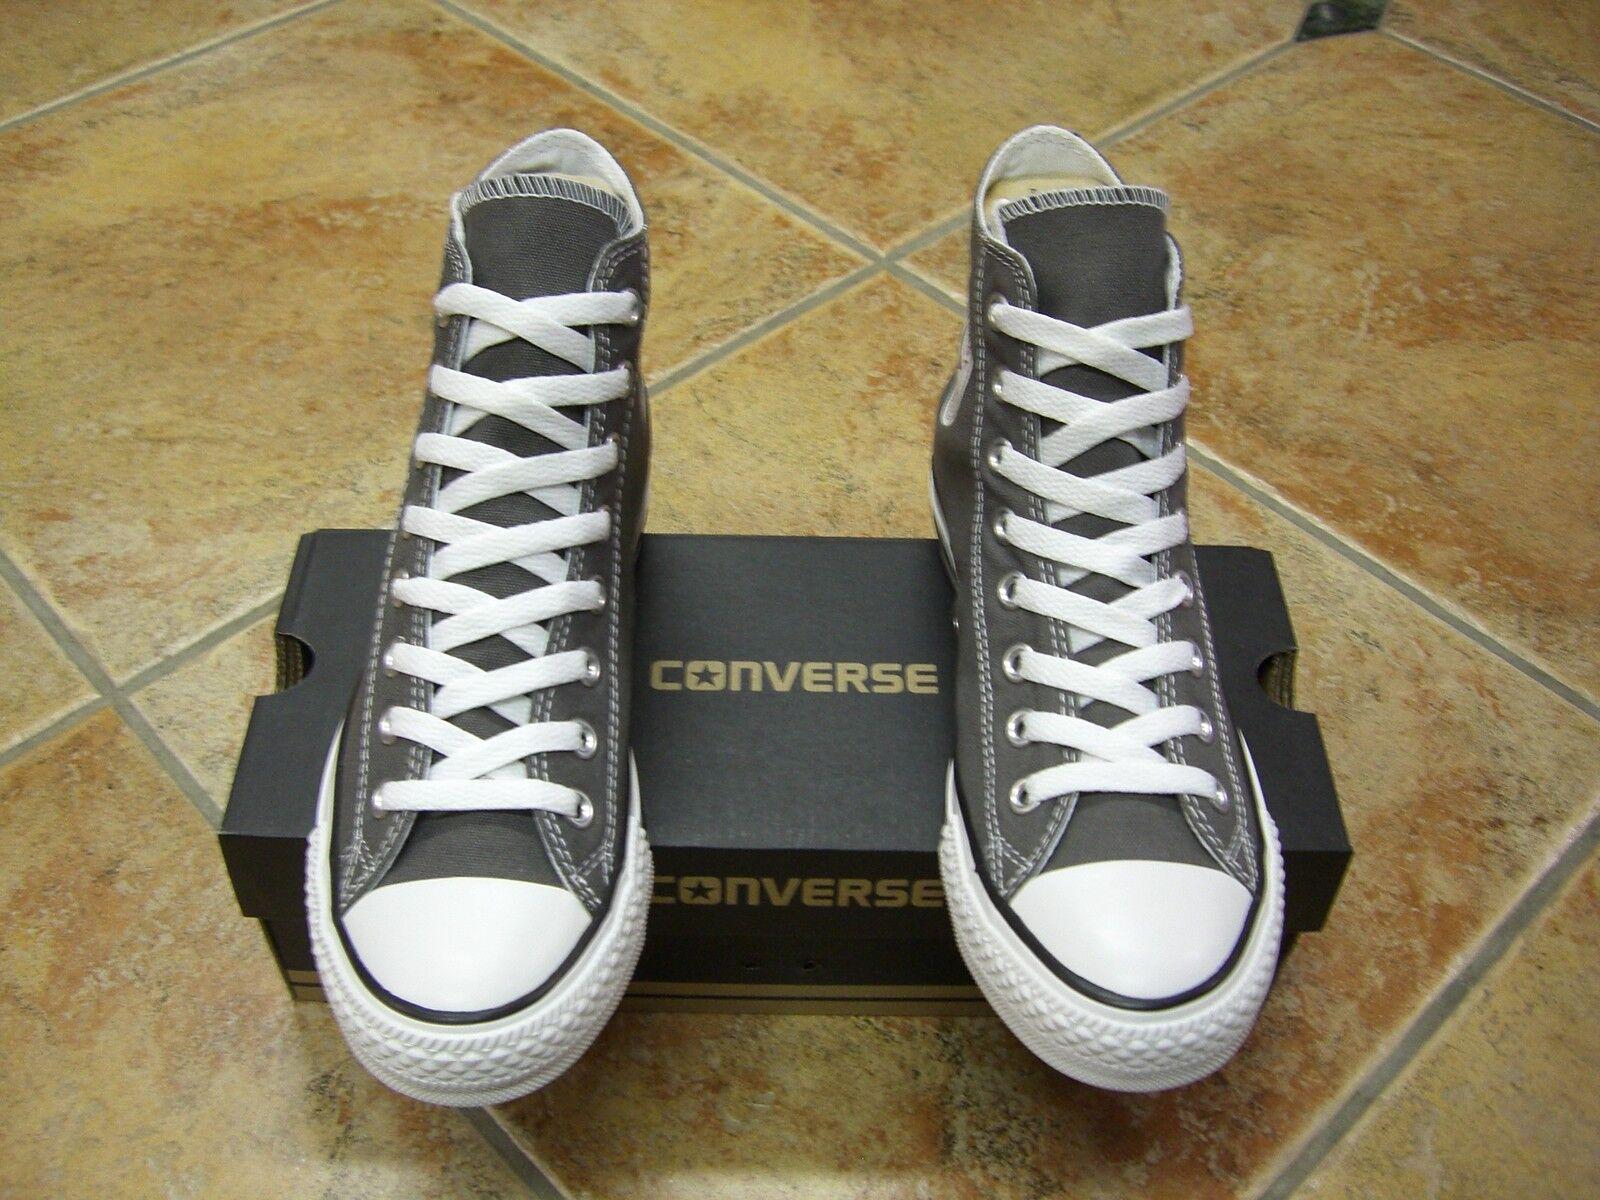 Converse Chucks All Star HI Gr.37 charcoal 1J793  NEU Trendy